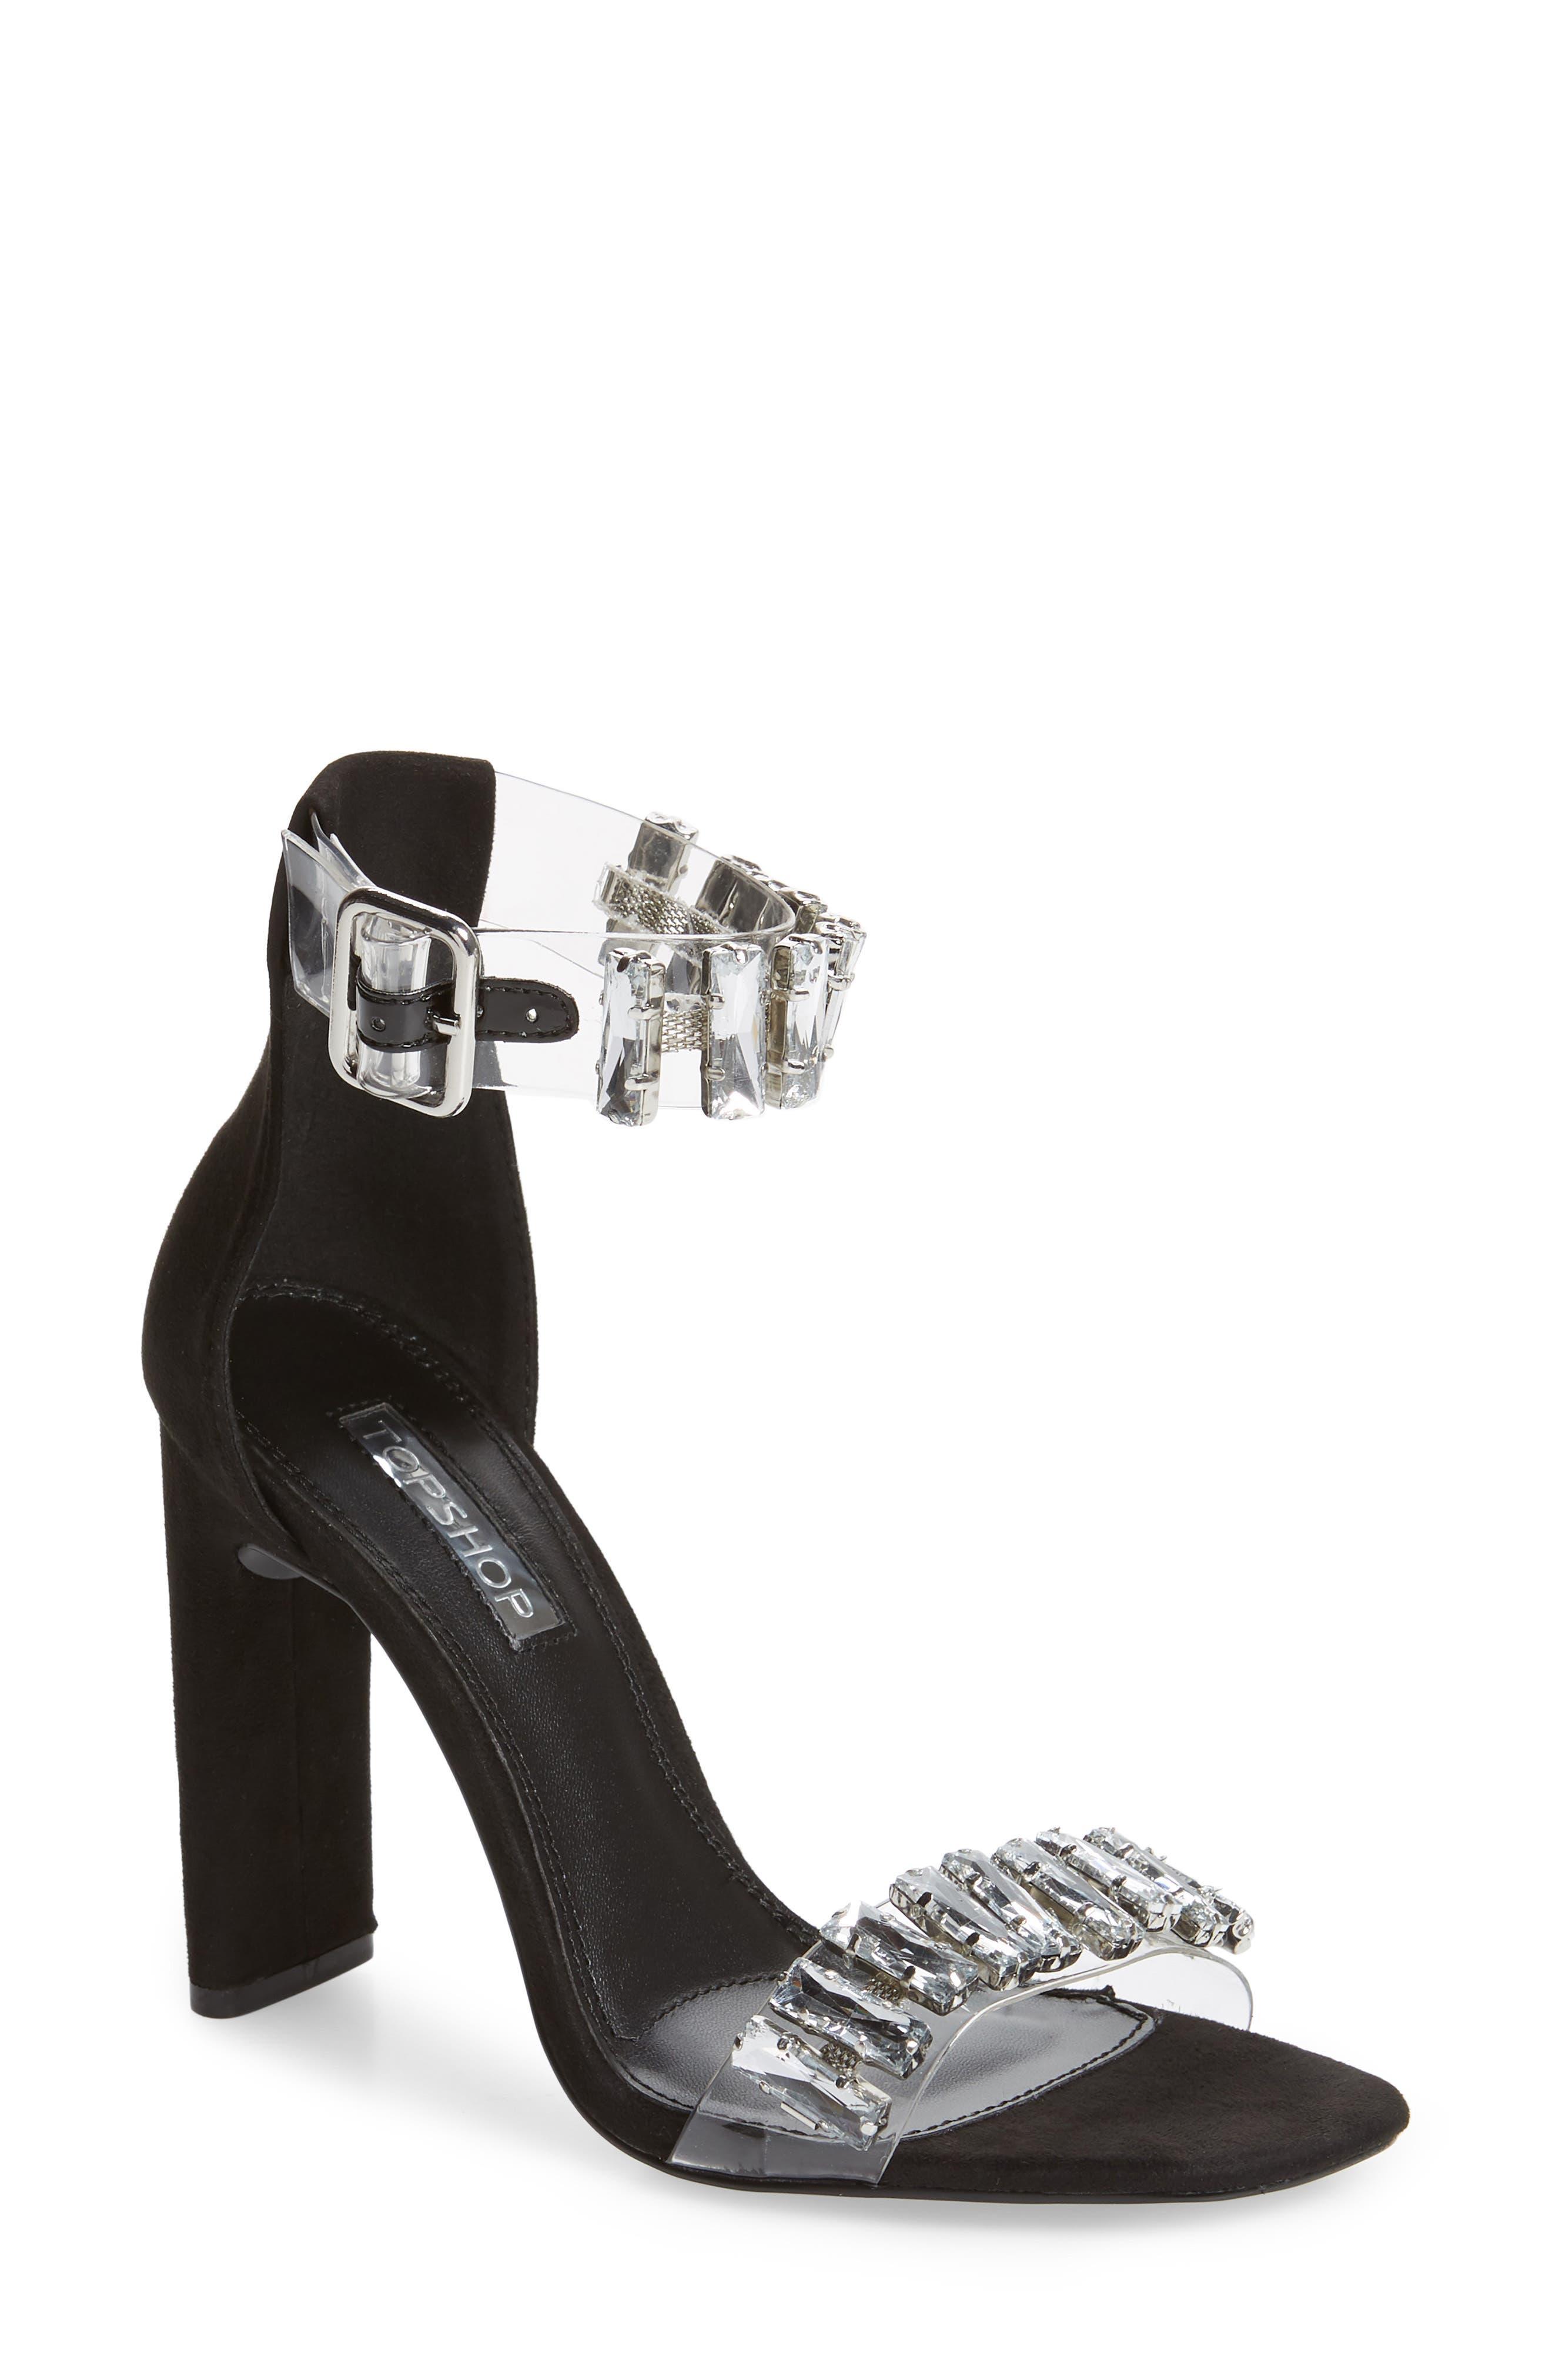 8fdb68494 Topshop Women s Sandals Shoes